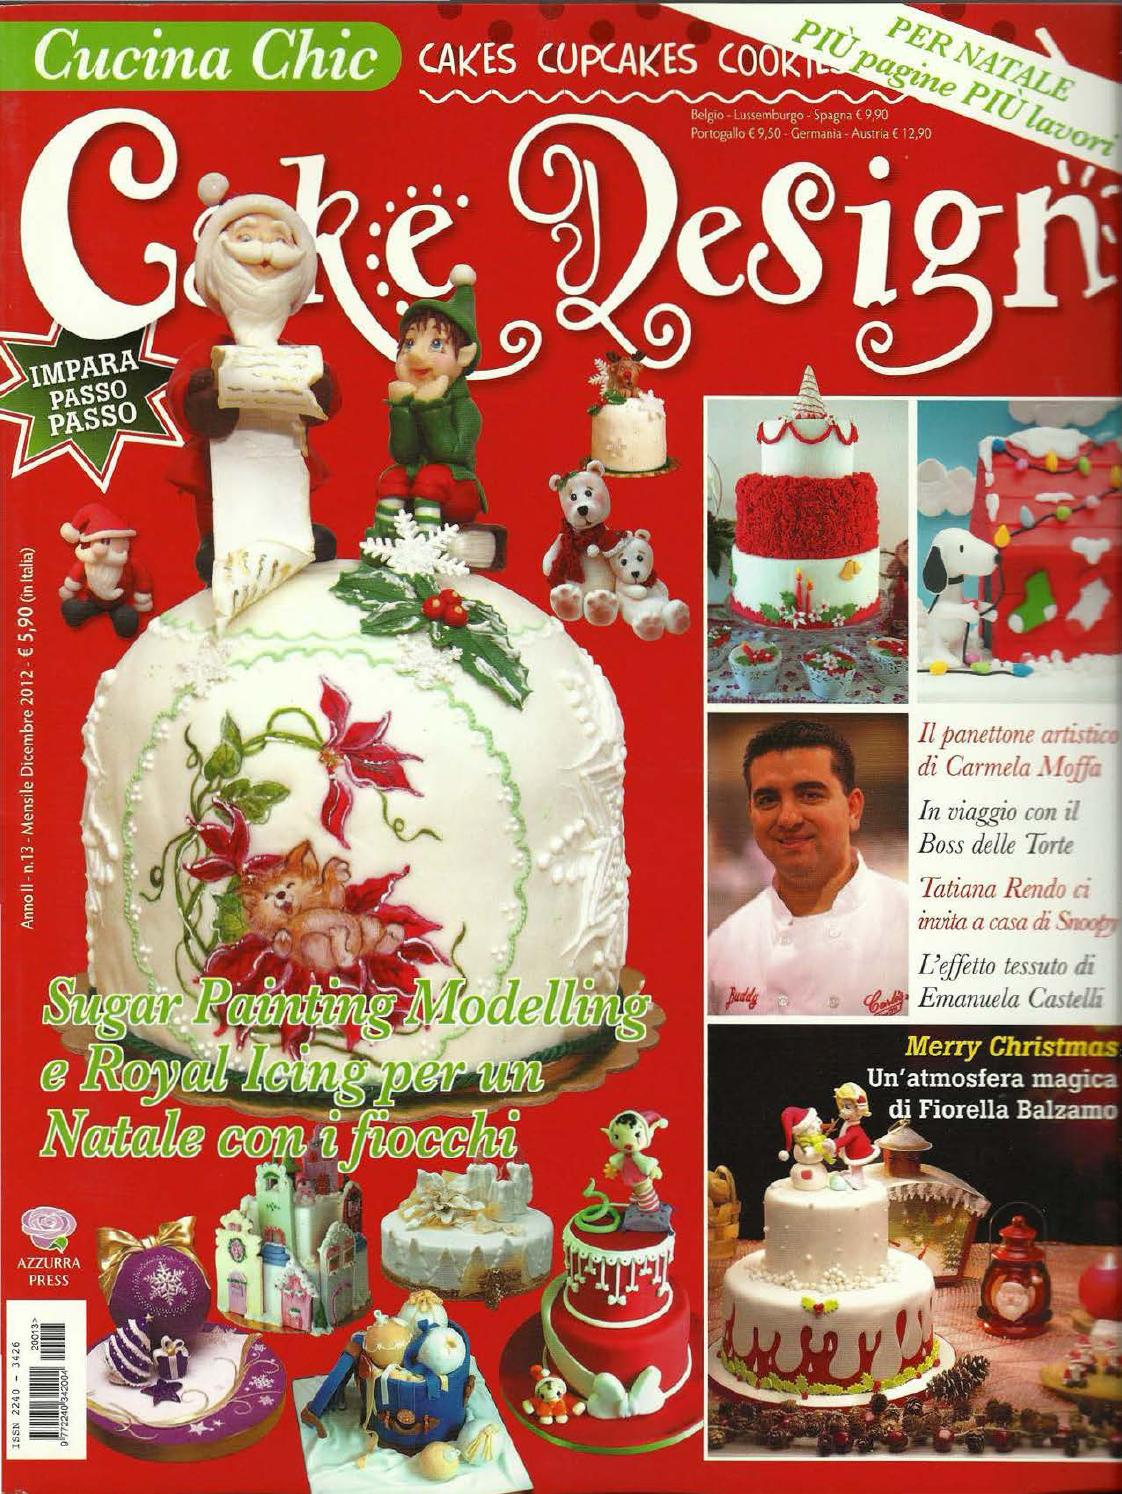 Cucina chic cake design 13 Balastro | Vebuka.com